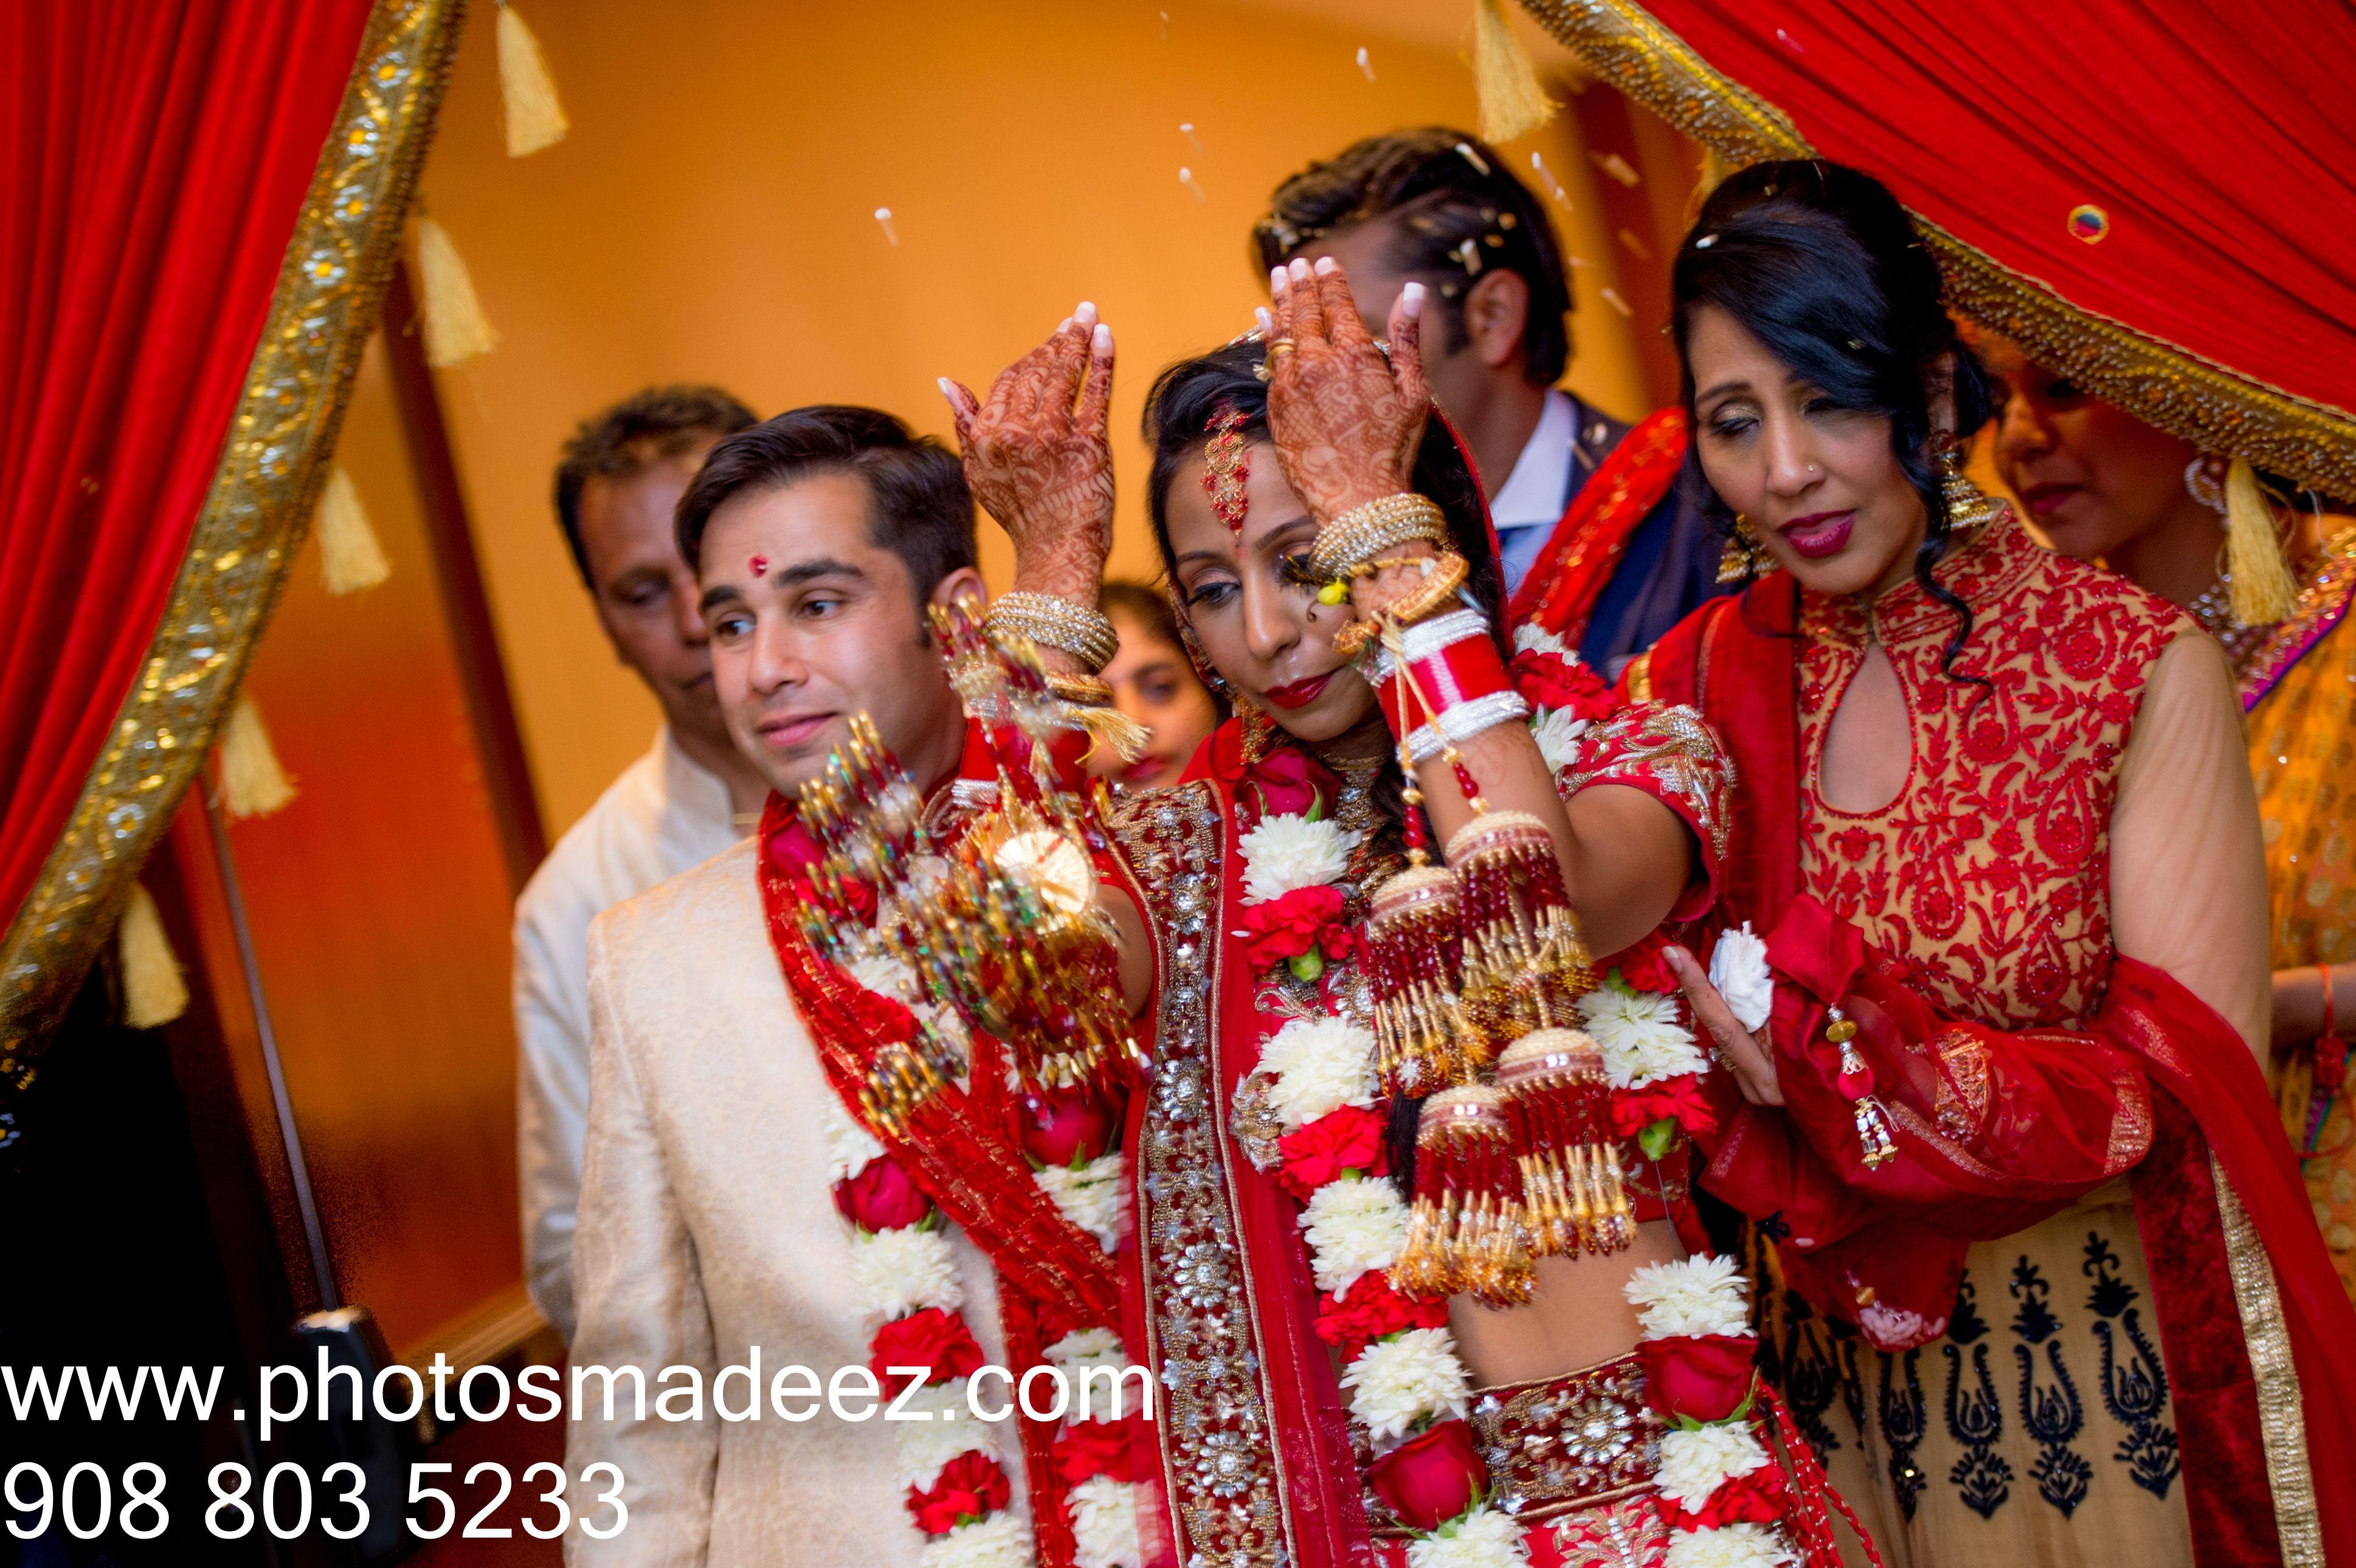 Vidai For Hindu Wedding Ceremony At Westinjersey City With Dj Gaurav Punjabi Wedding In New Jersey Best Indian Wedding Photographers Photosmadeez